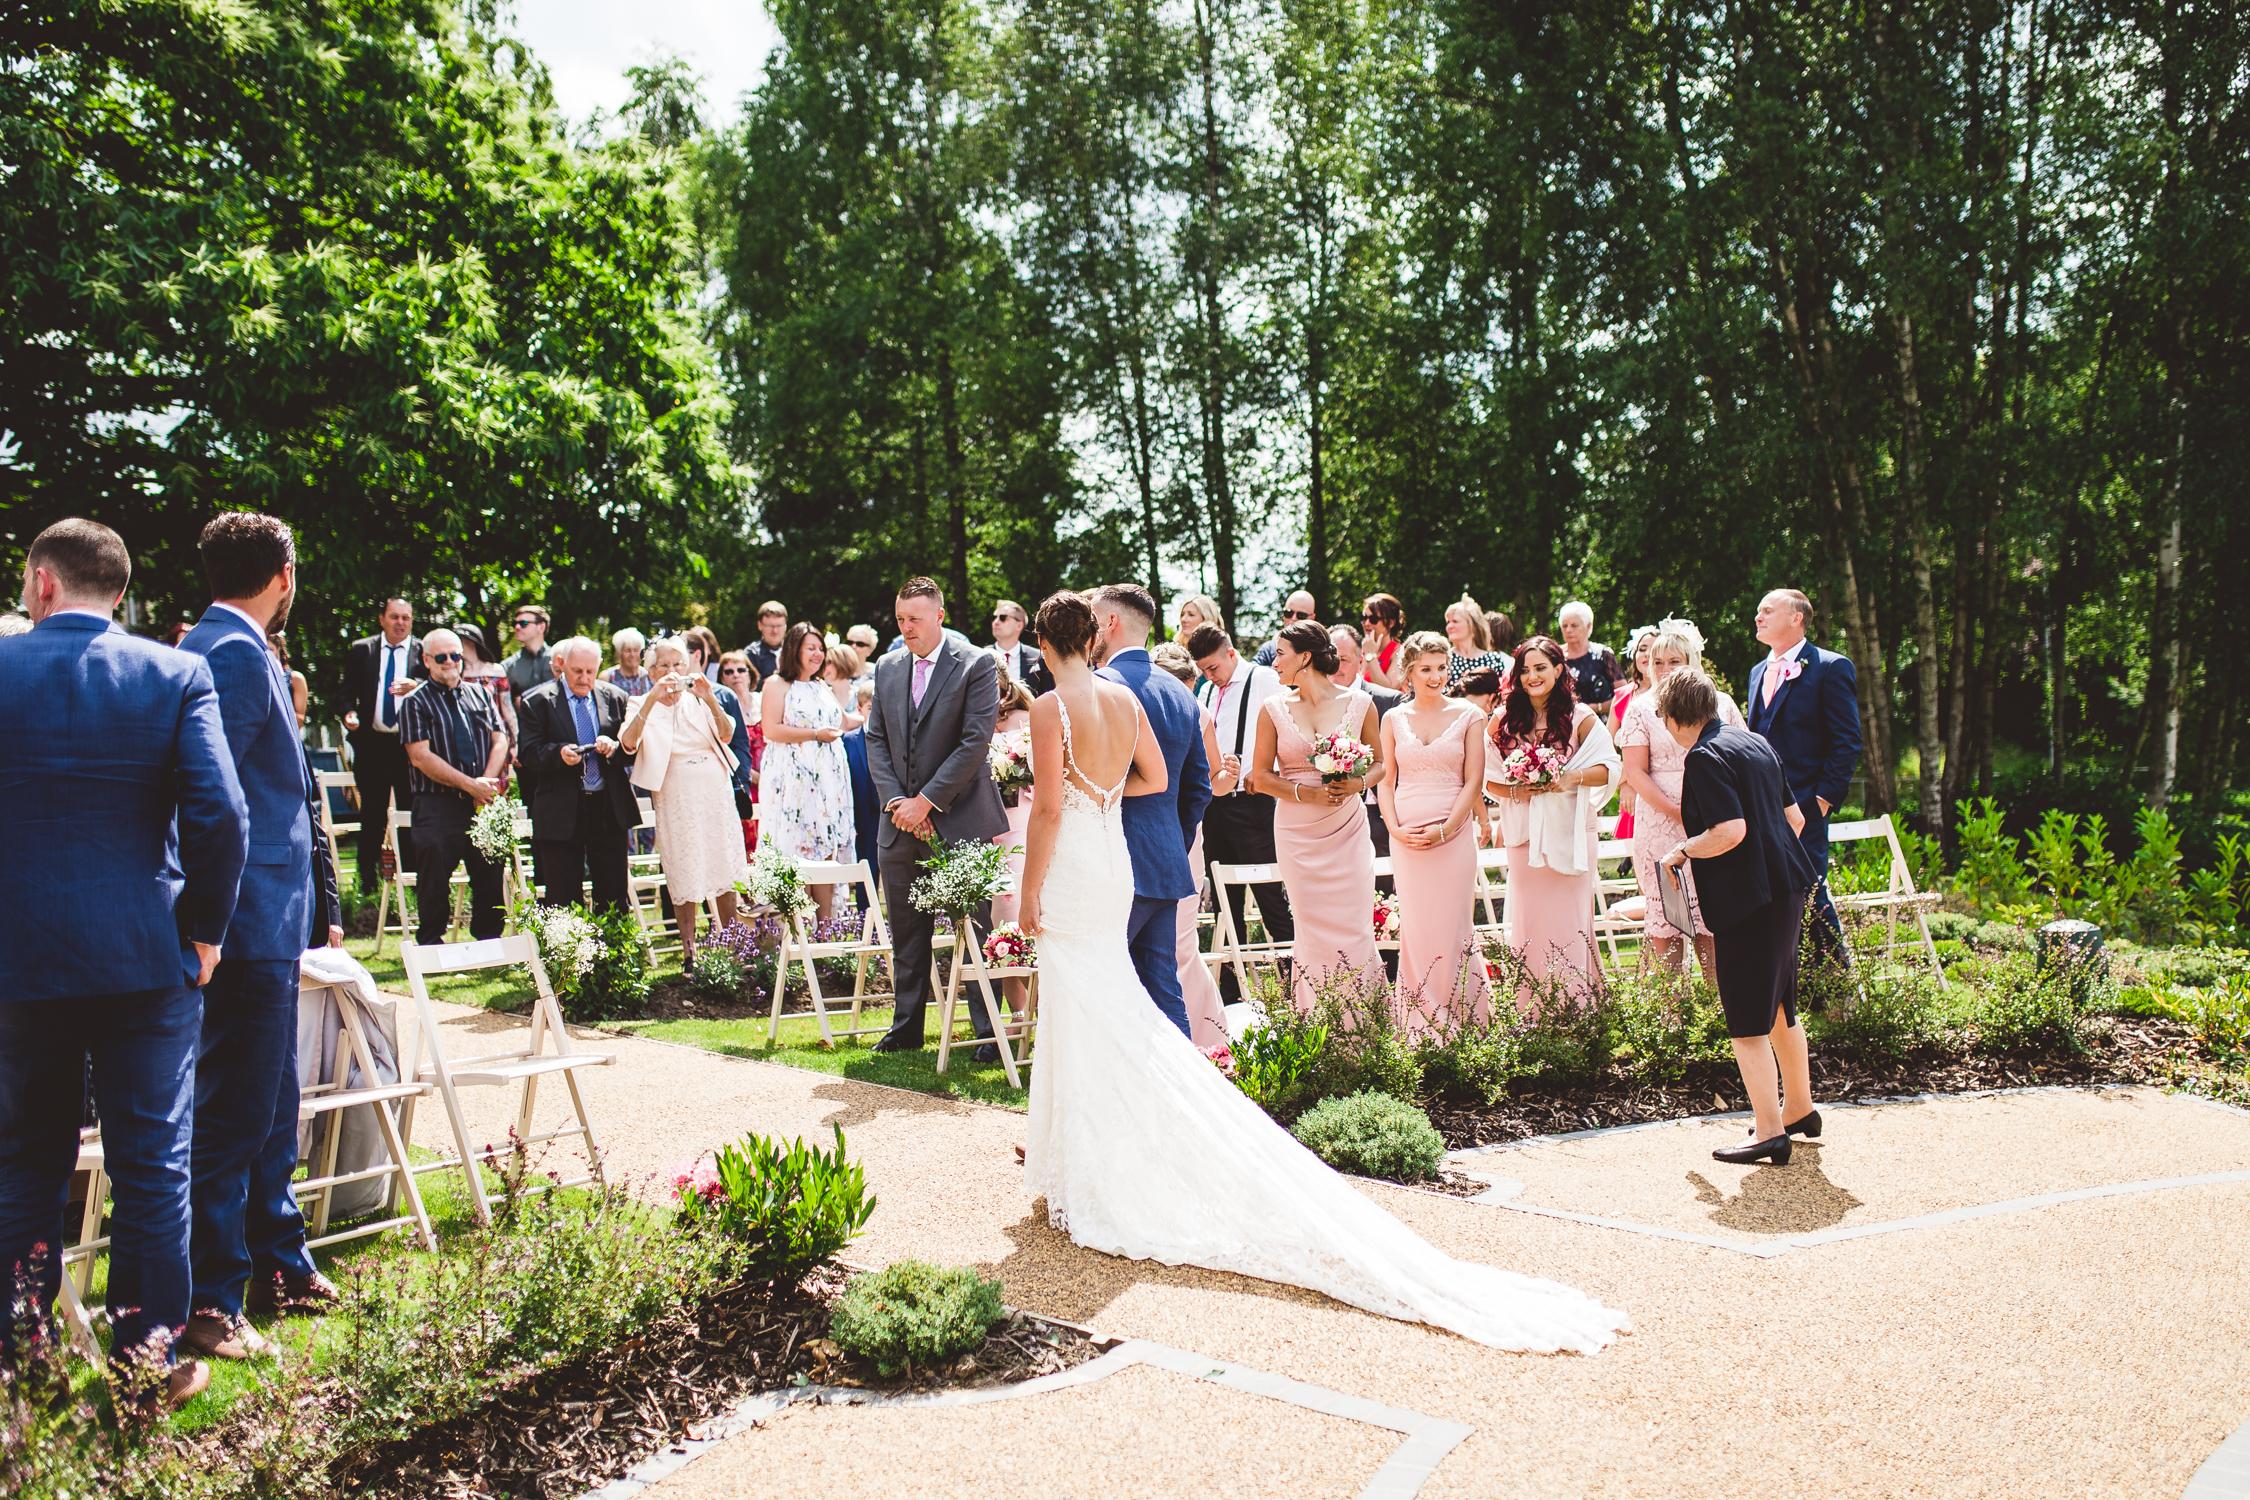 Tunbridge Wells Wedding Vilcinskaite Photo 39.jpg